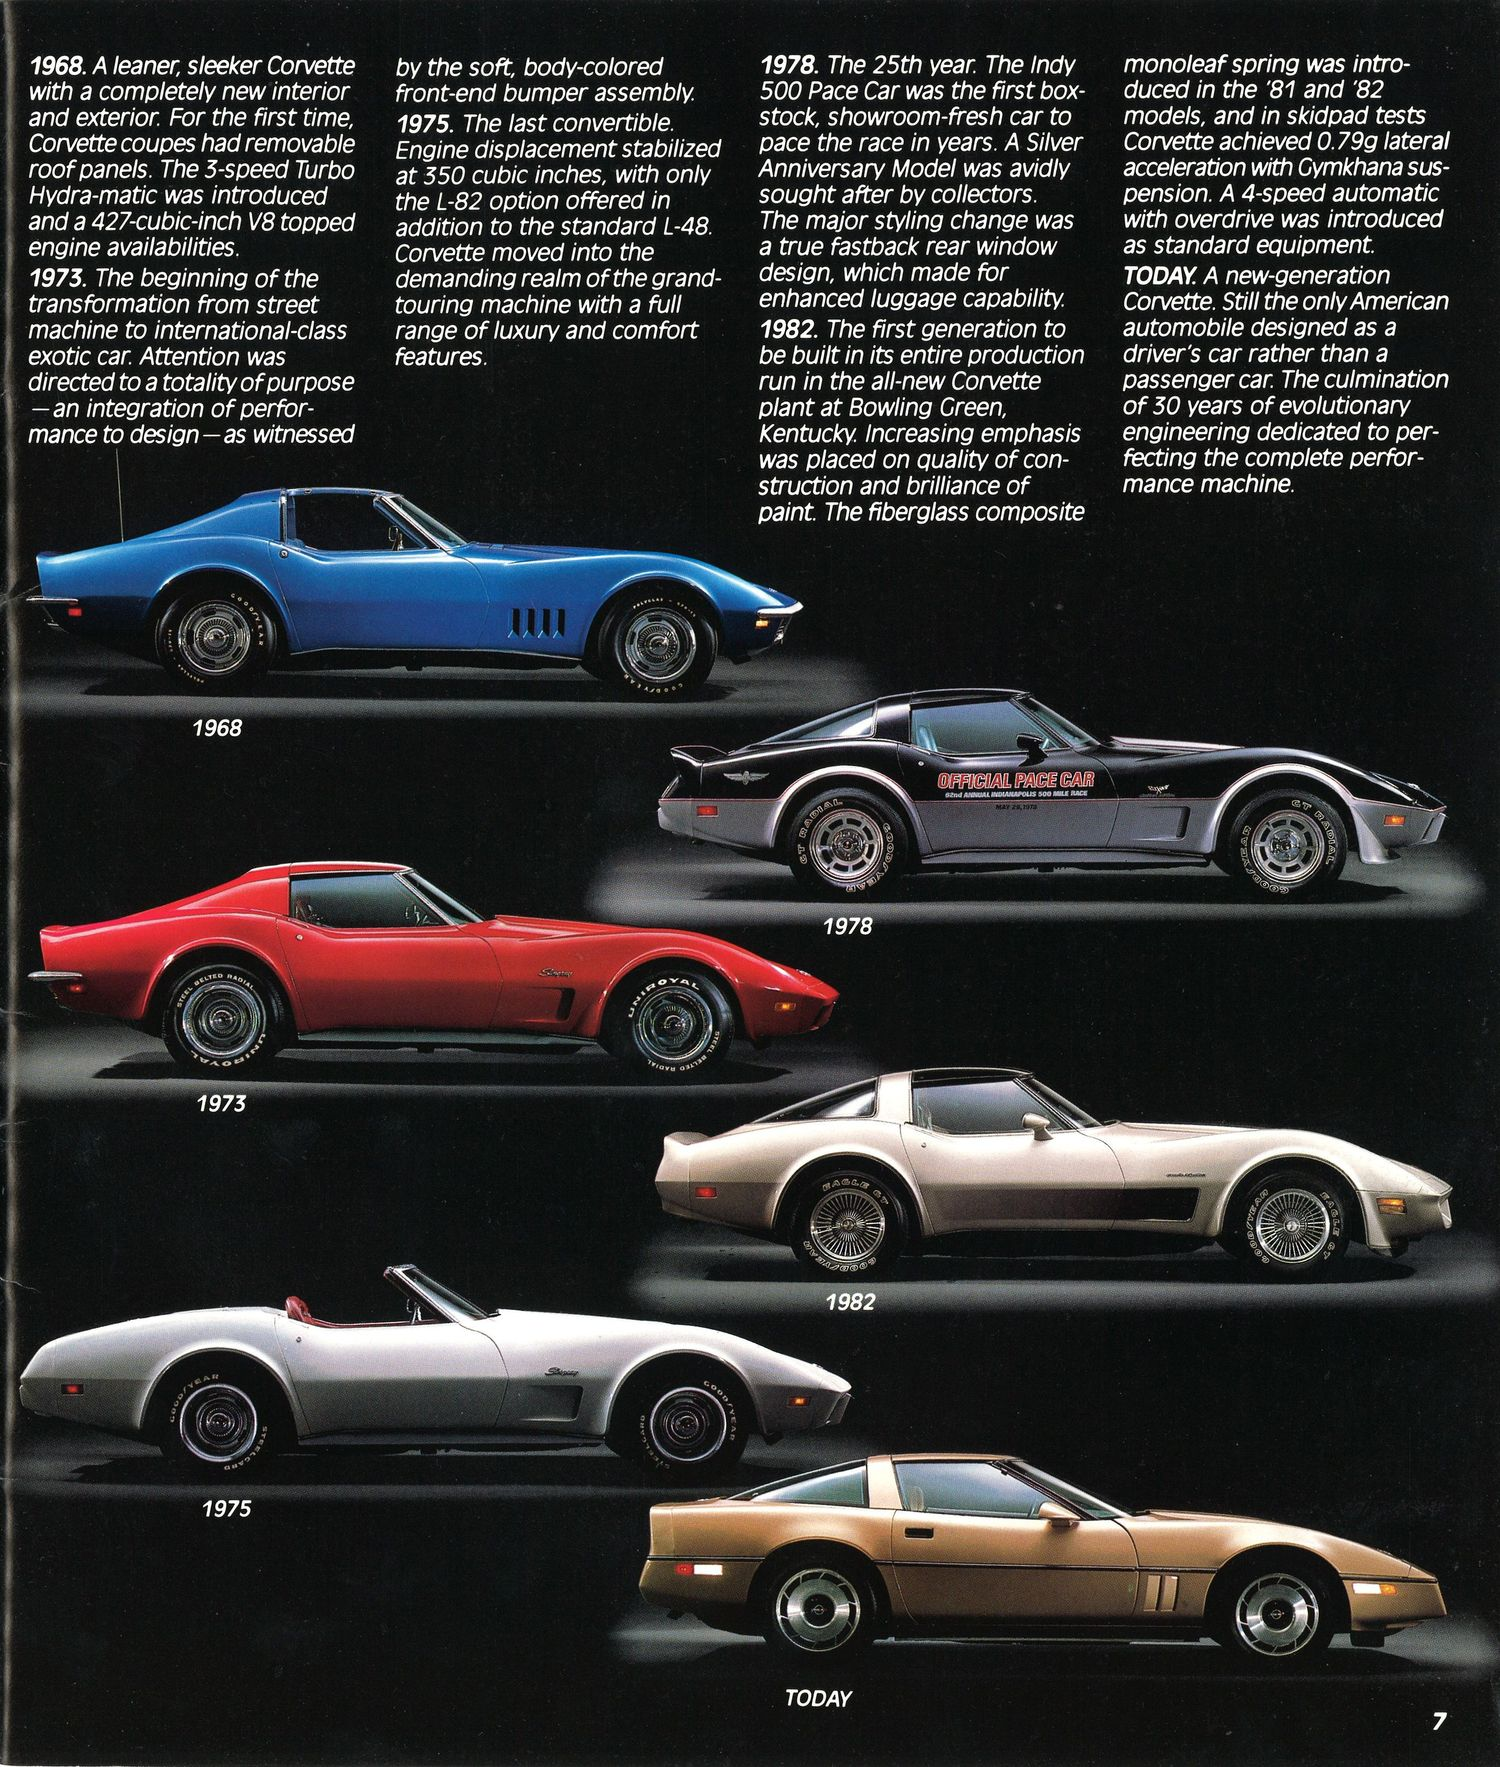 C4 Corvette Brochure is a Blast From the Past - autoevolution